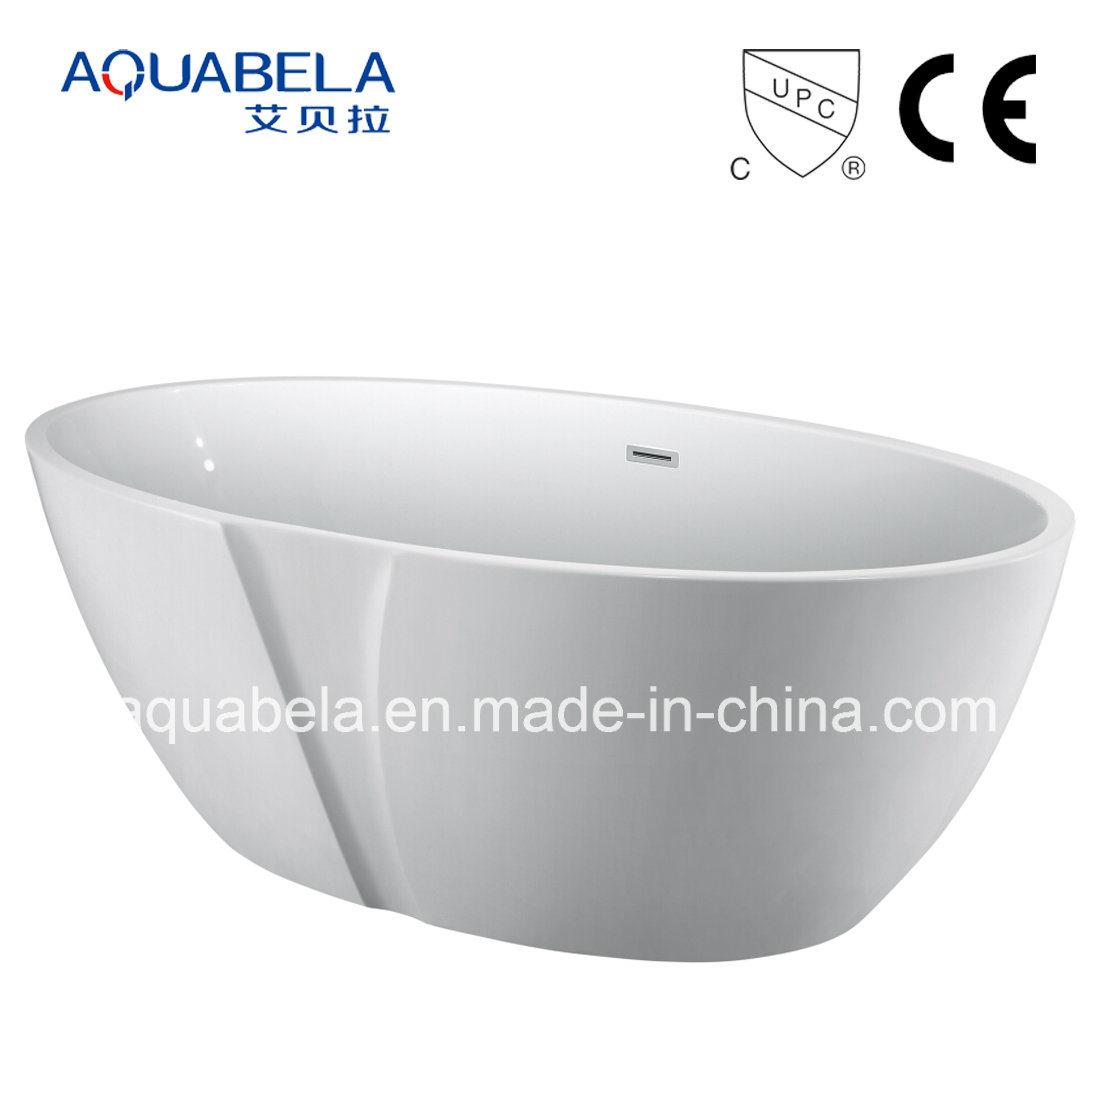 CE/Cupc New Design Acrylic Seamless Bathroom Tub Jacuzzi Bathtub (JL654)